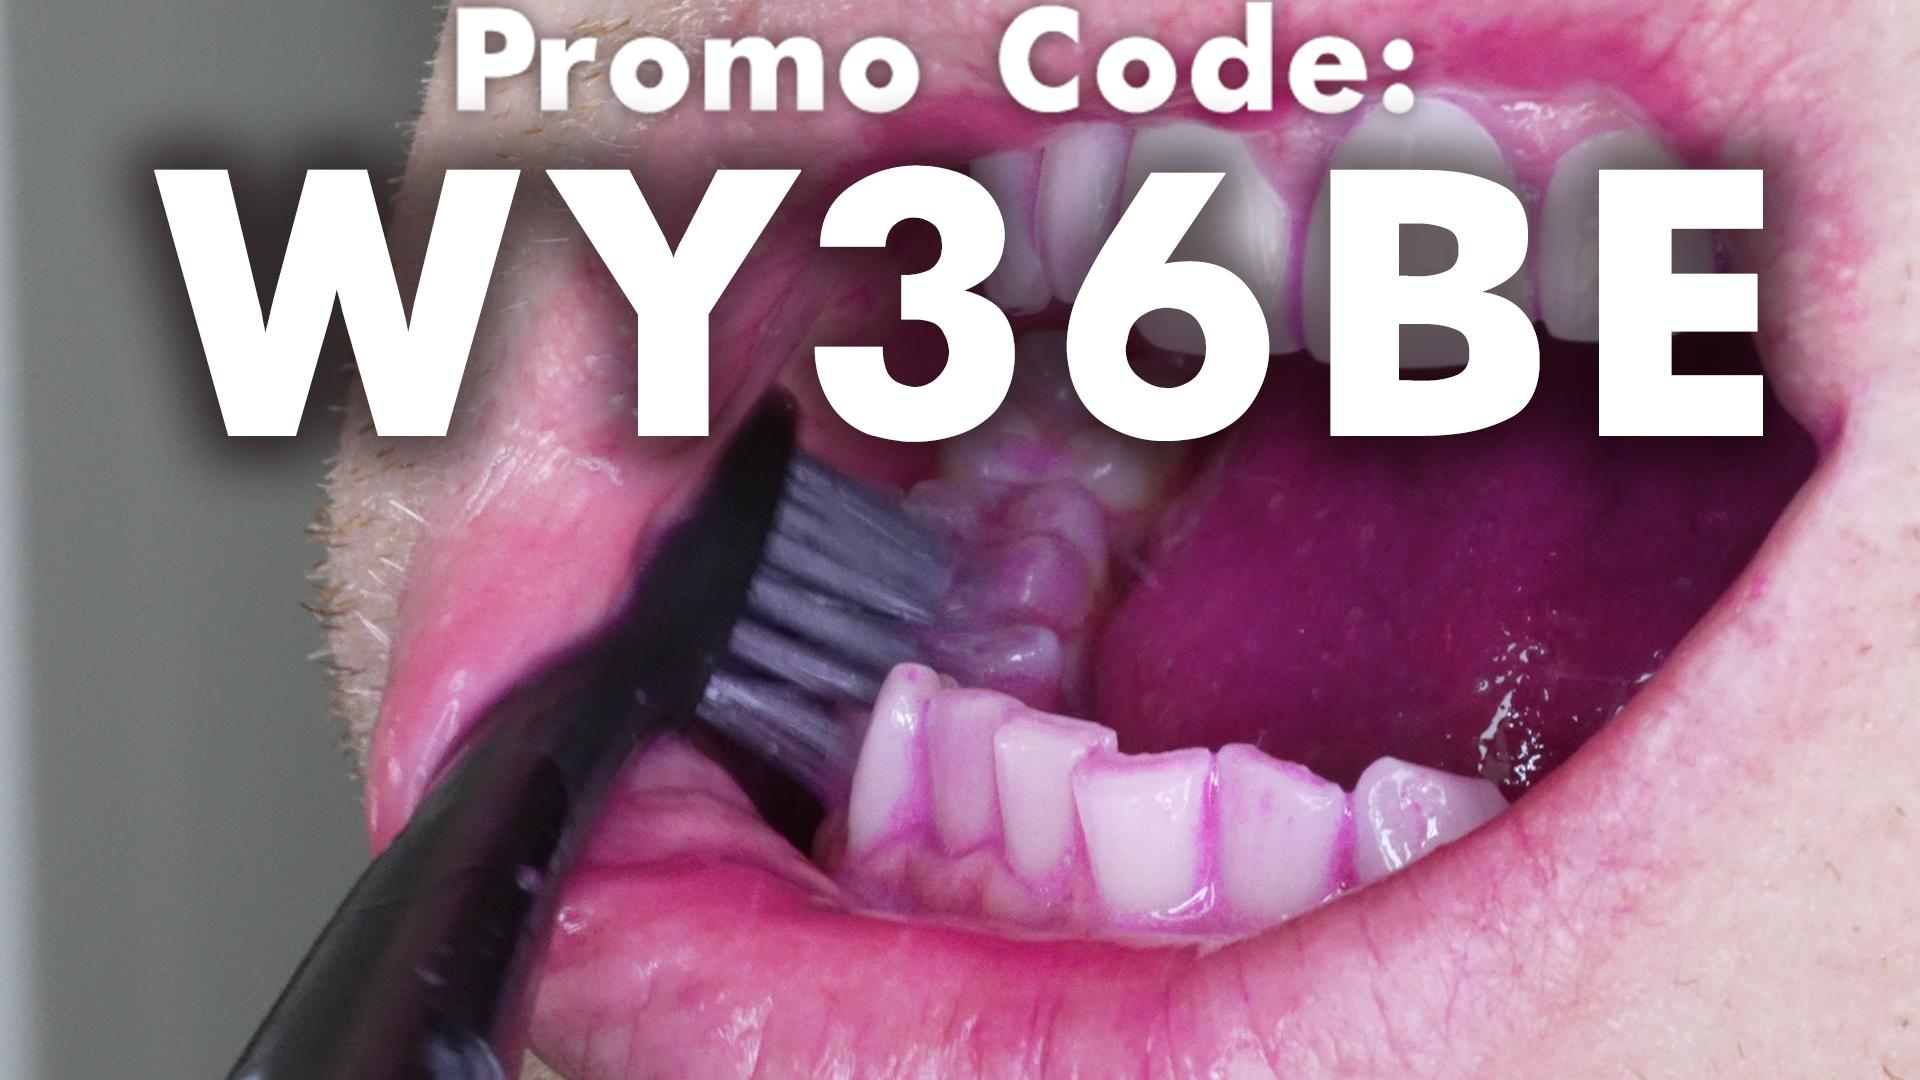 Burst Promo Code Burst Oral Care Toothbrush